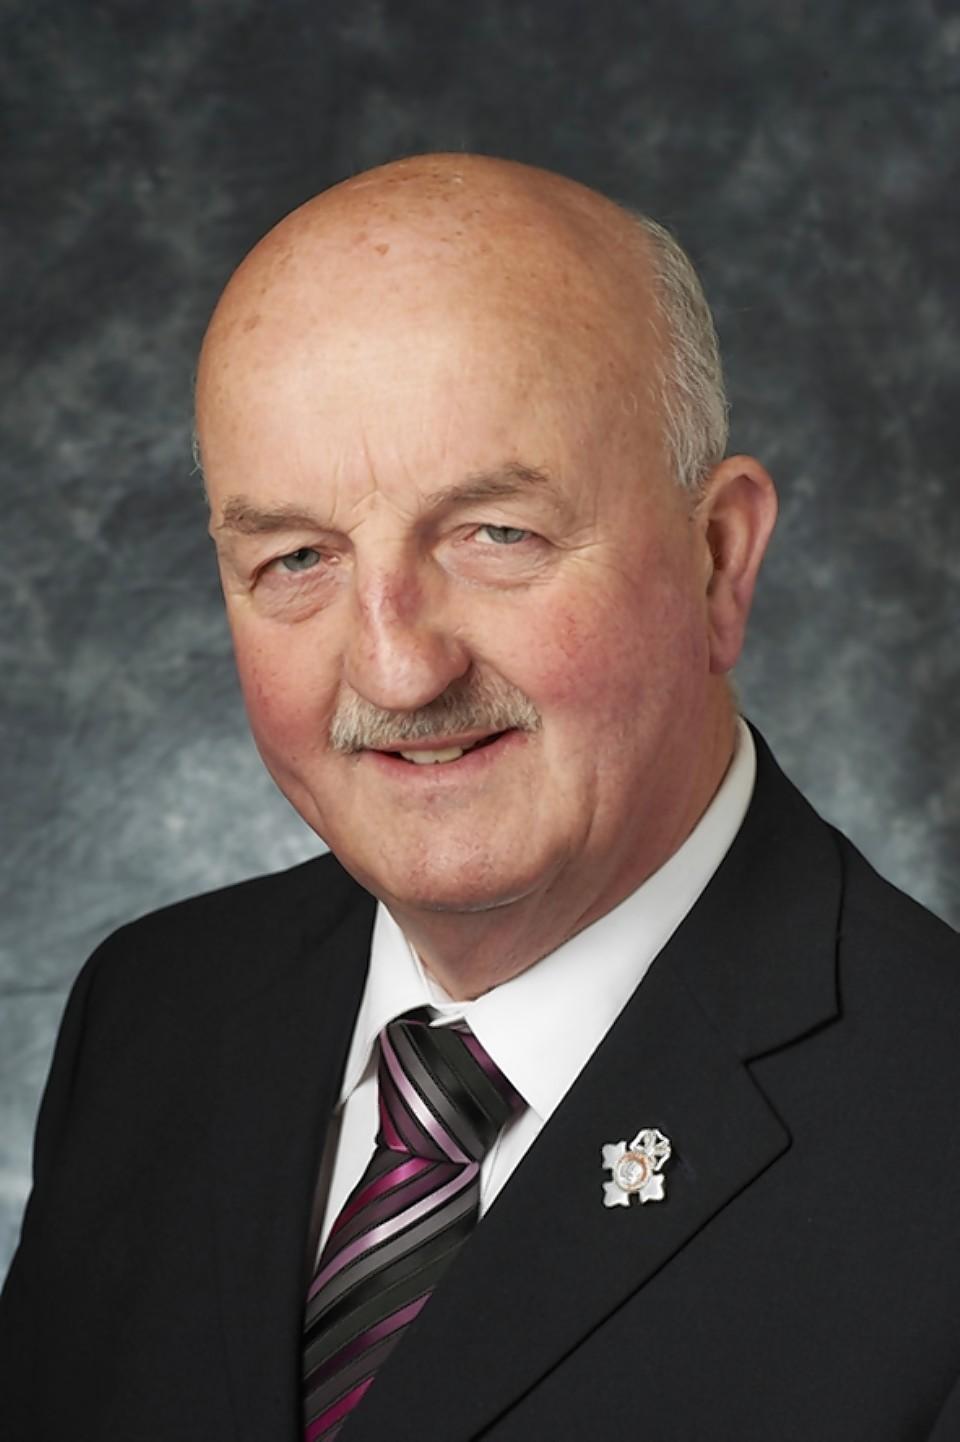 Councillor Willie Mackay